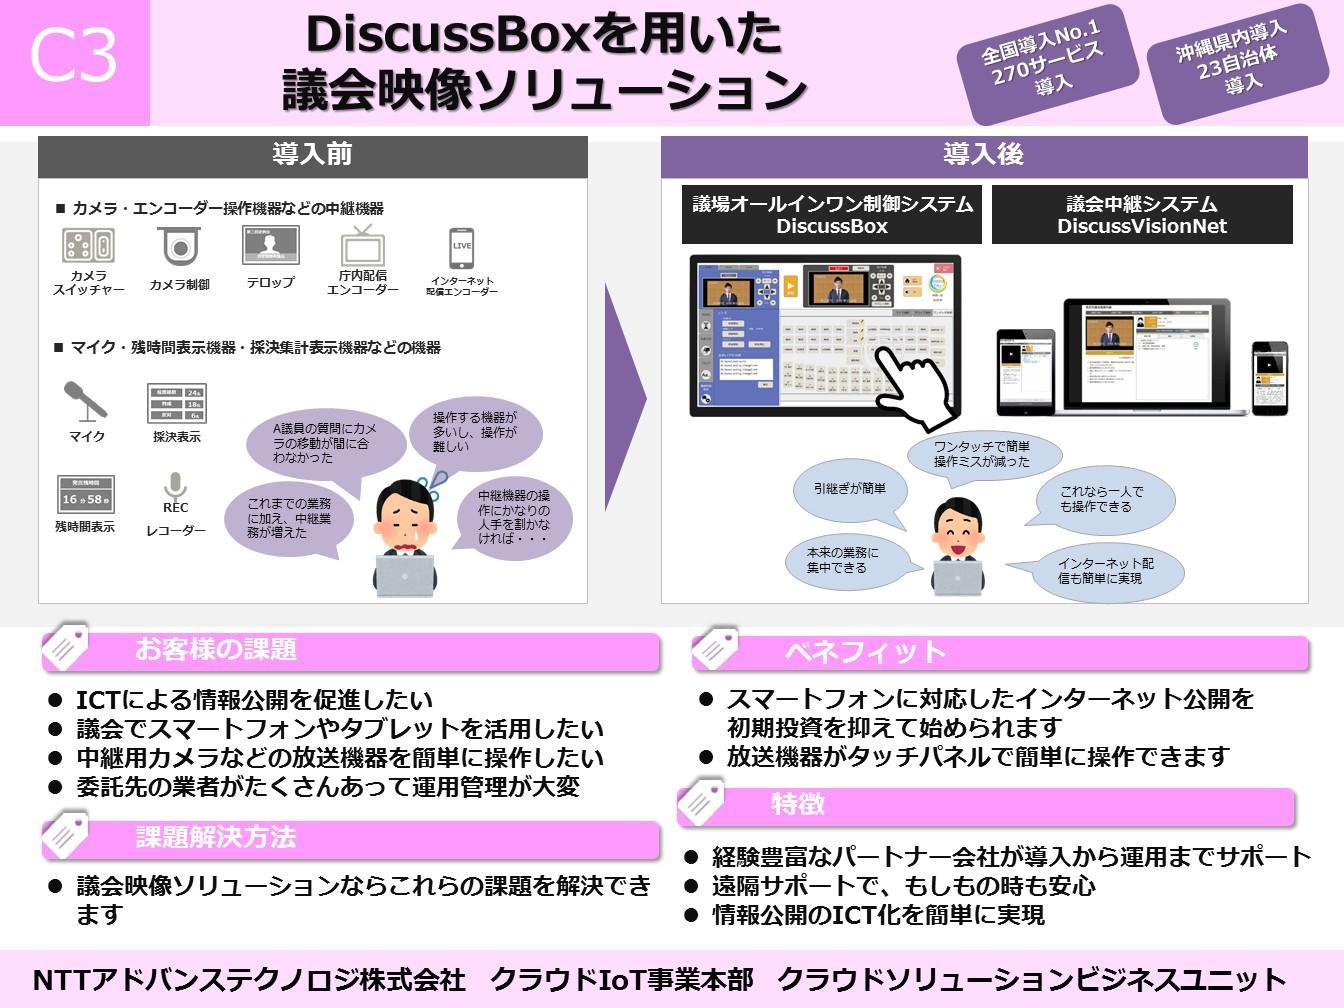 Discuss Boxの出展パネル。DiscussBoxを用いた 議会映像ソリューション